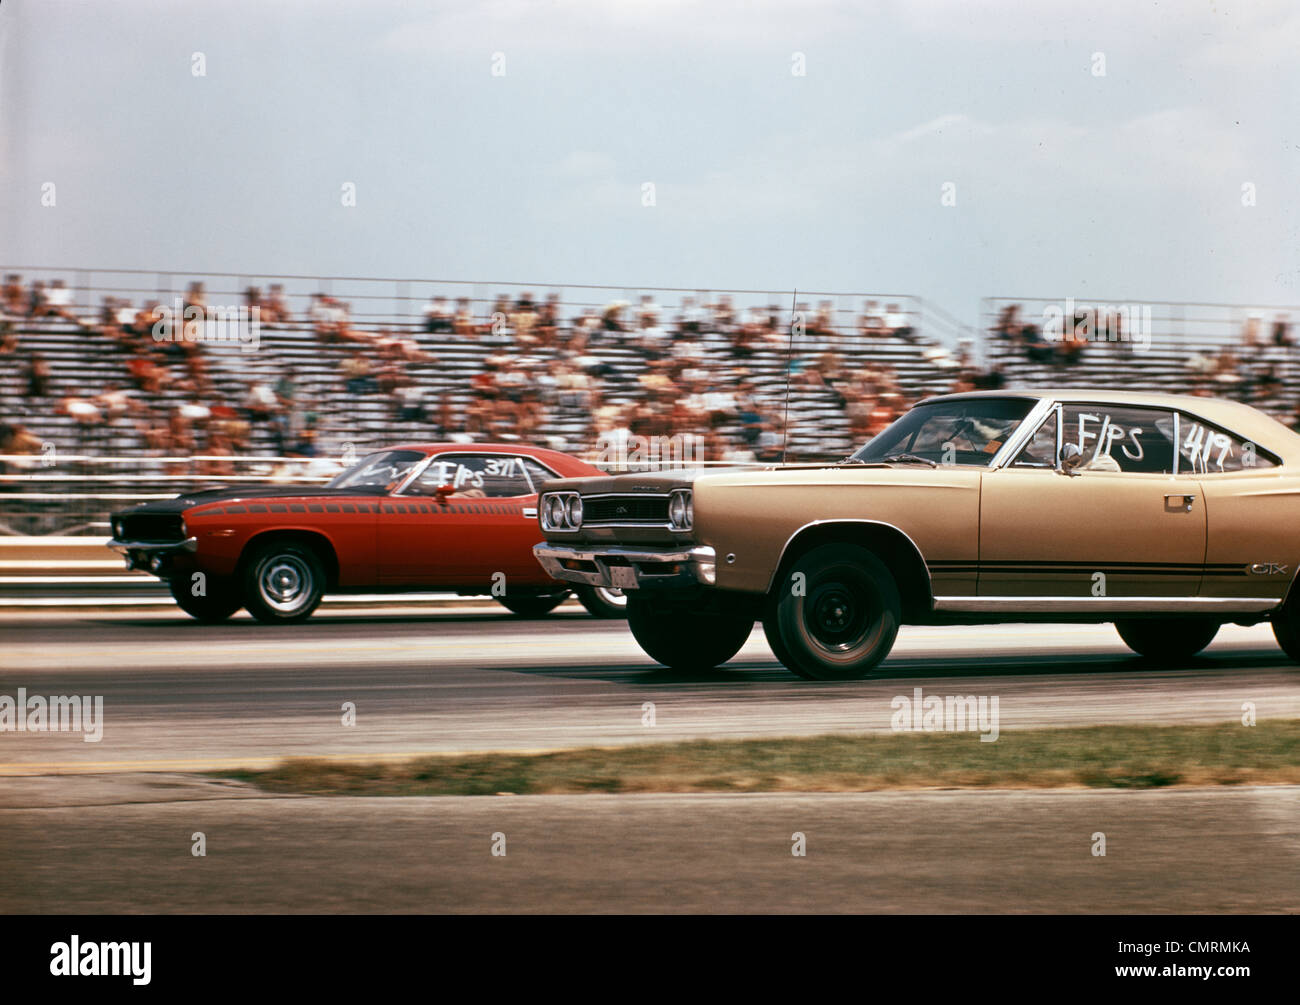 1970 1970 2 VOITURES DRAG RACING COURSE AUTOMOBILE COMPÉTITION VITESSE TRIBUNE BROWNSVILLE INDIANA RACEWAY Photo Stock